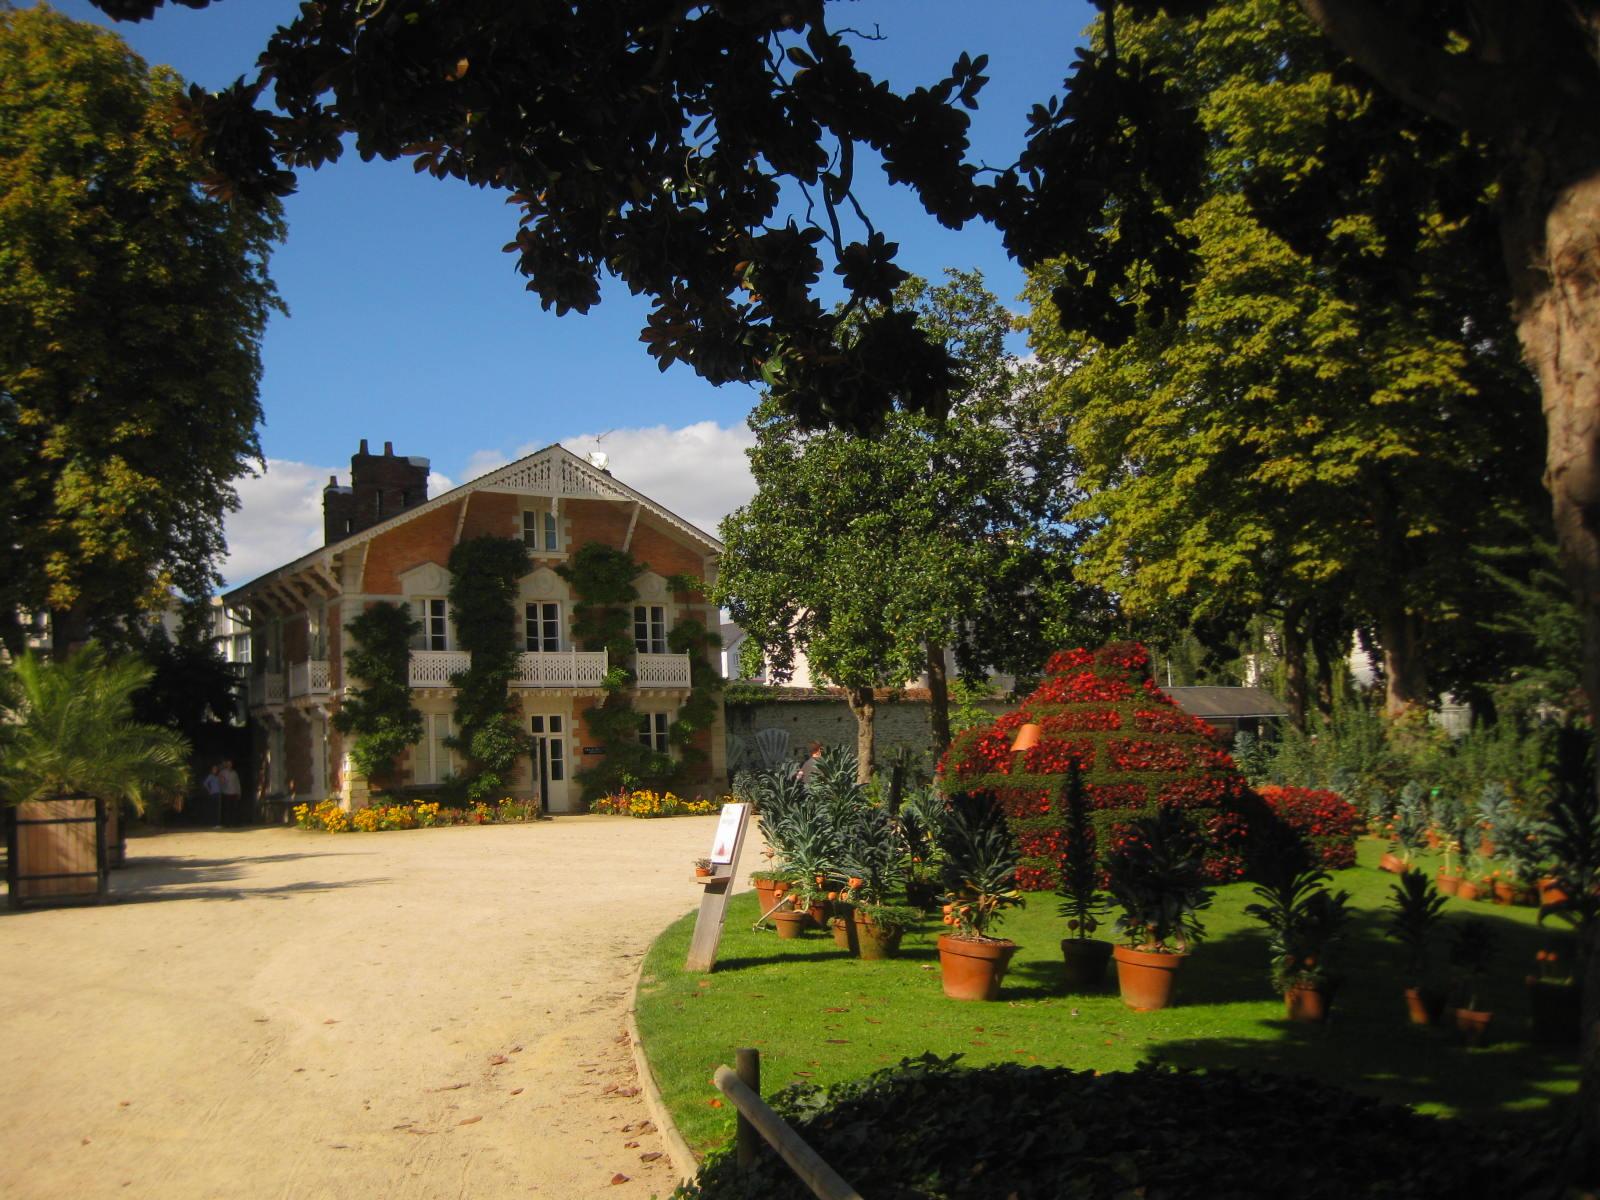 Blog de nantes septembre 2016 for Jardin des 5 sens nantes